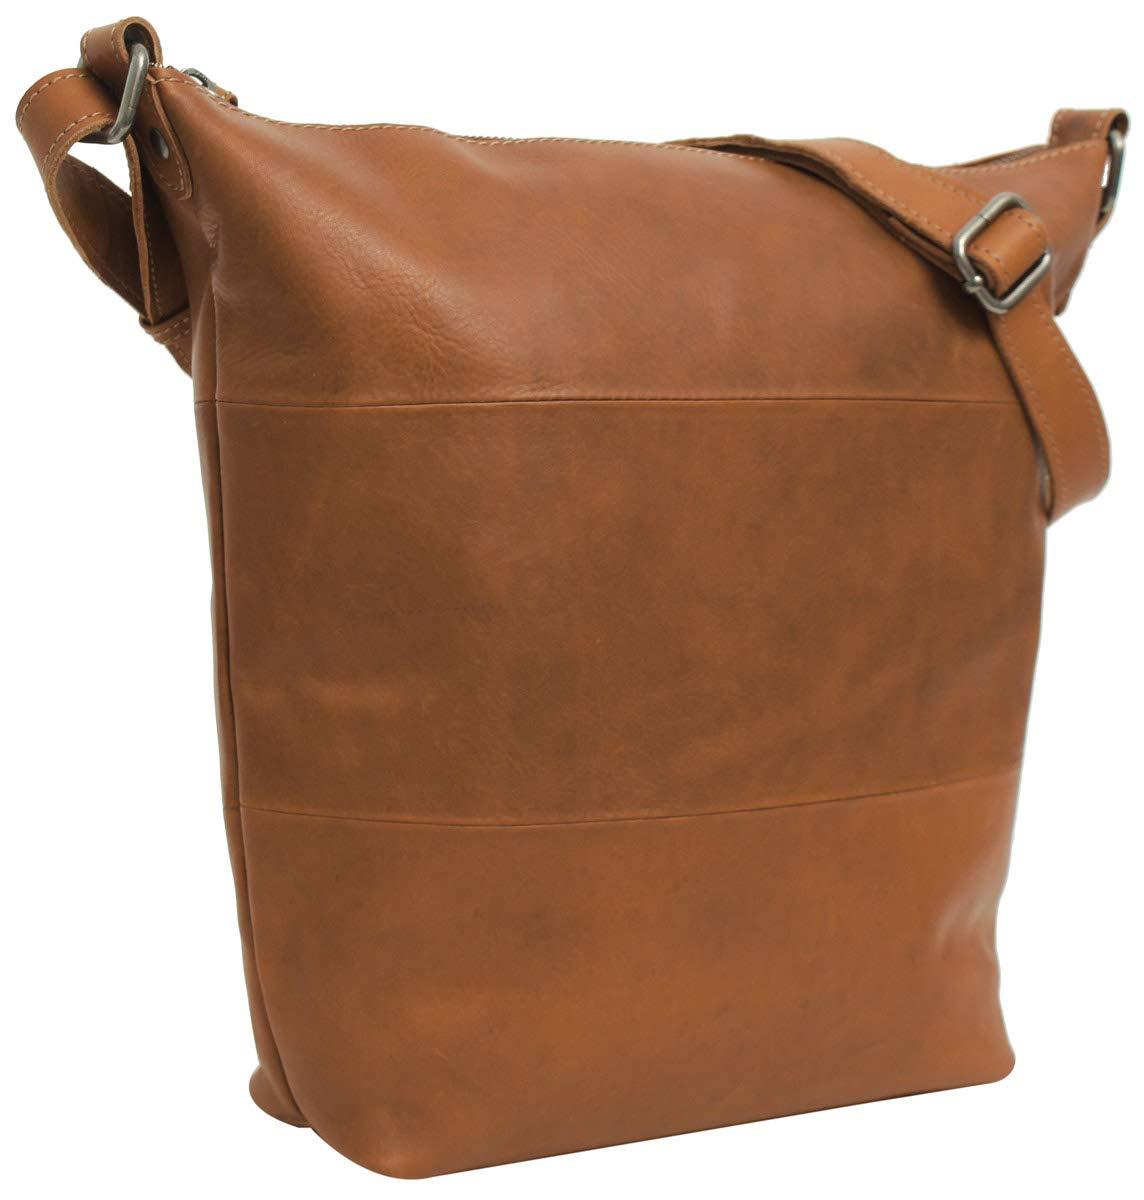 "Gusti Sac cabas Cuir studio ""Zahara"" sac à main vintage sac en bandoulière rétro femme marron clair 2M45-29-1 S"